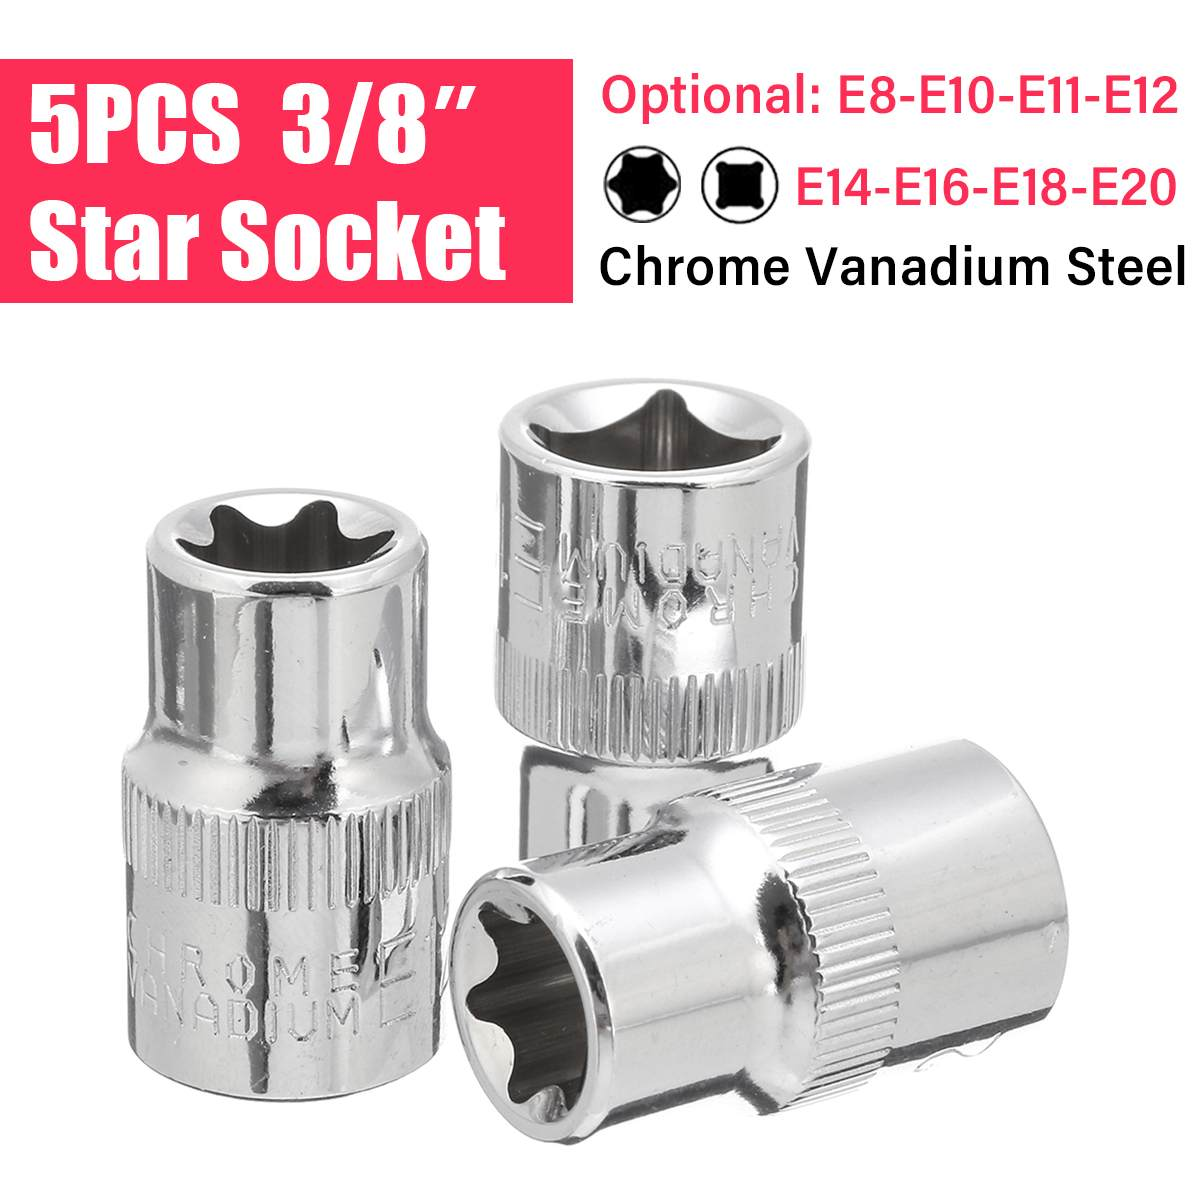 5pcs 6 Point Star Socket Hand Tools E-shape Wrench Head E8 E10 E11 E12 E14 E16 E18 E20 Professional Metalworking Car Repair Tool